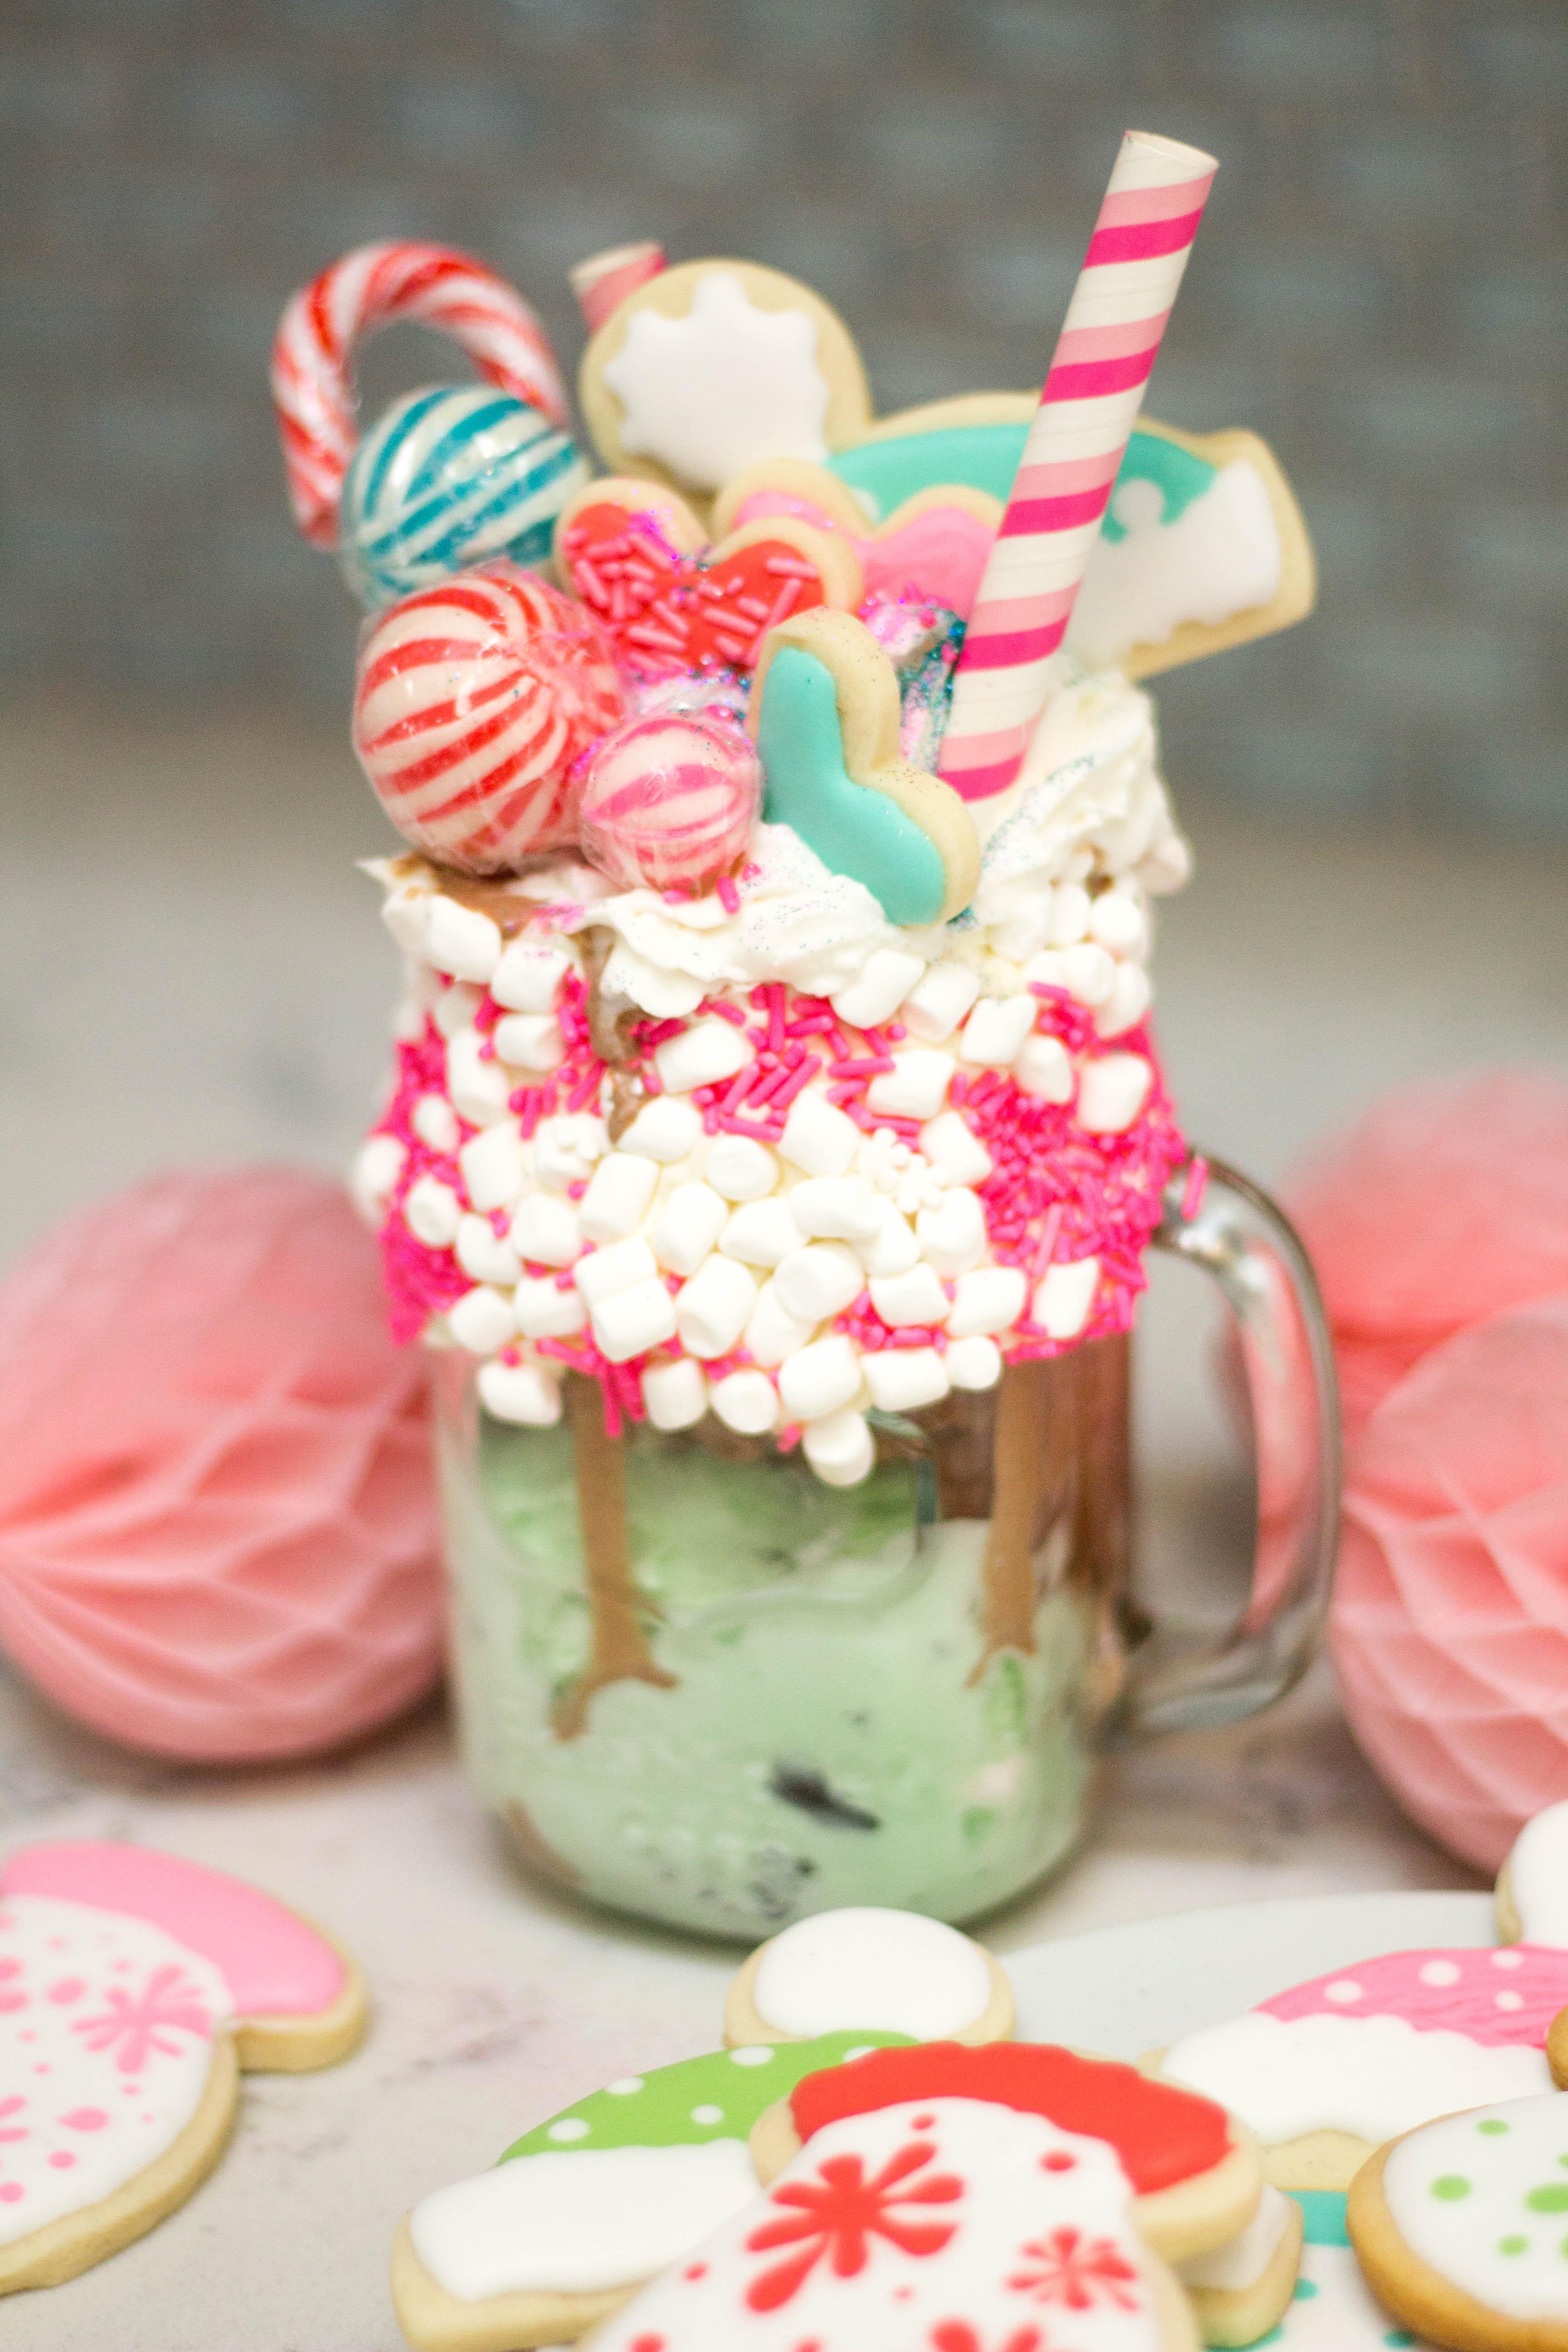 winter-baking-ice-cream-freak-shake-creative-desserts-overload-30